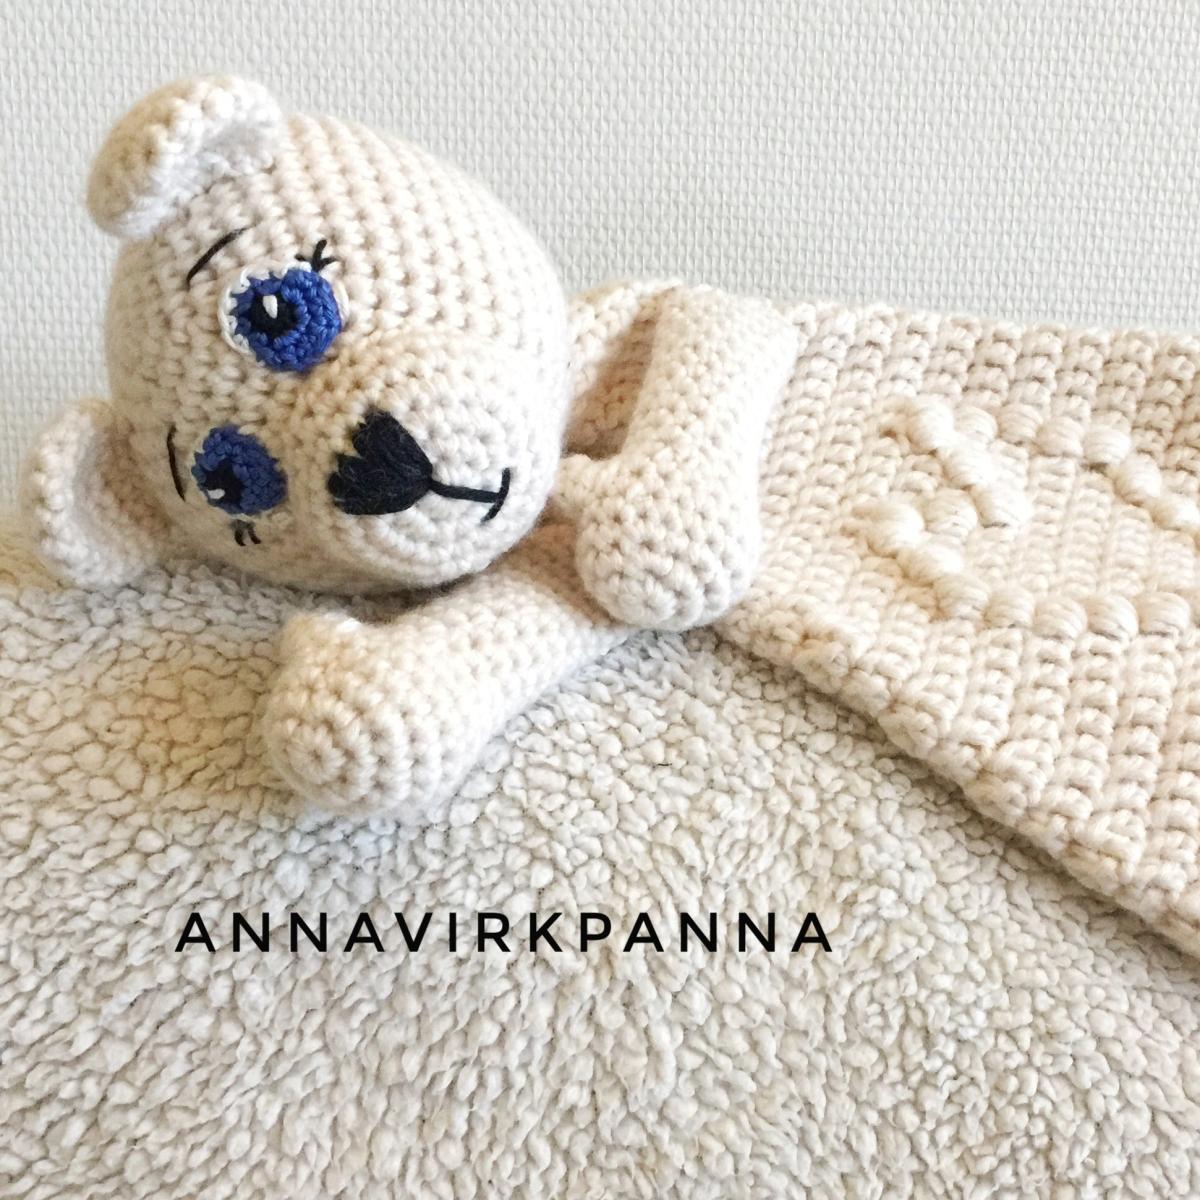 Mönster Snutte Isbjörn / Pattern Polarbear Ragdoll